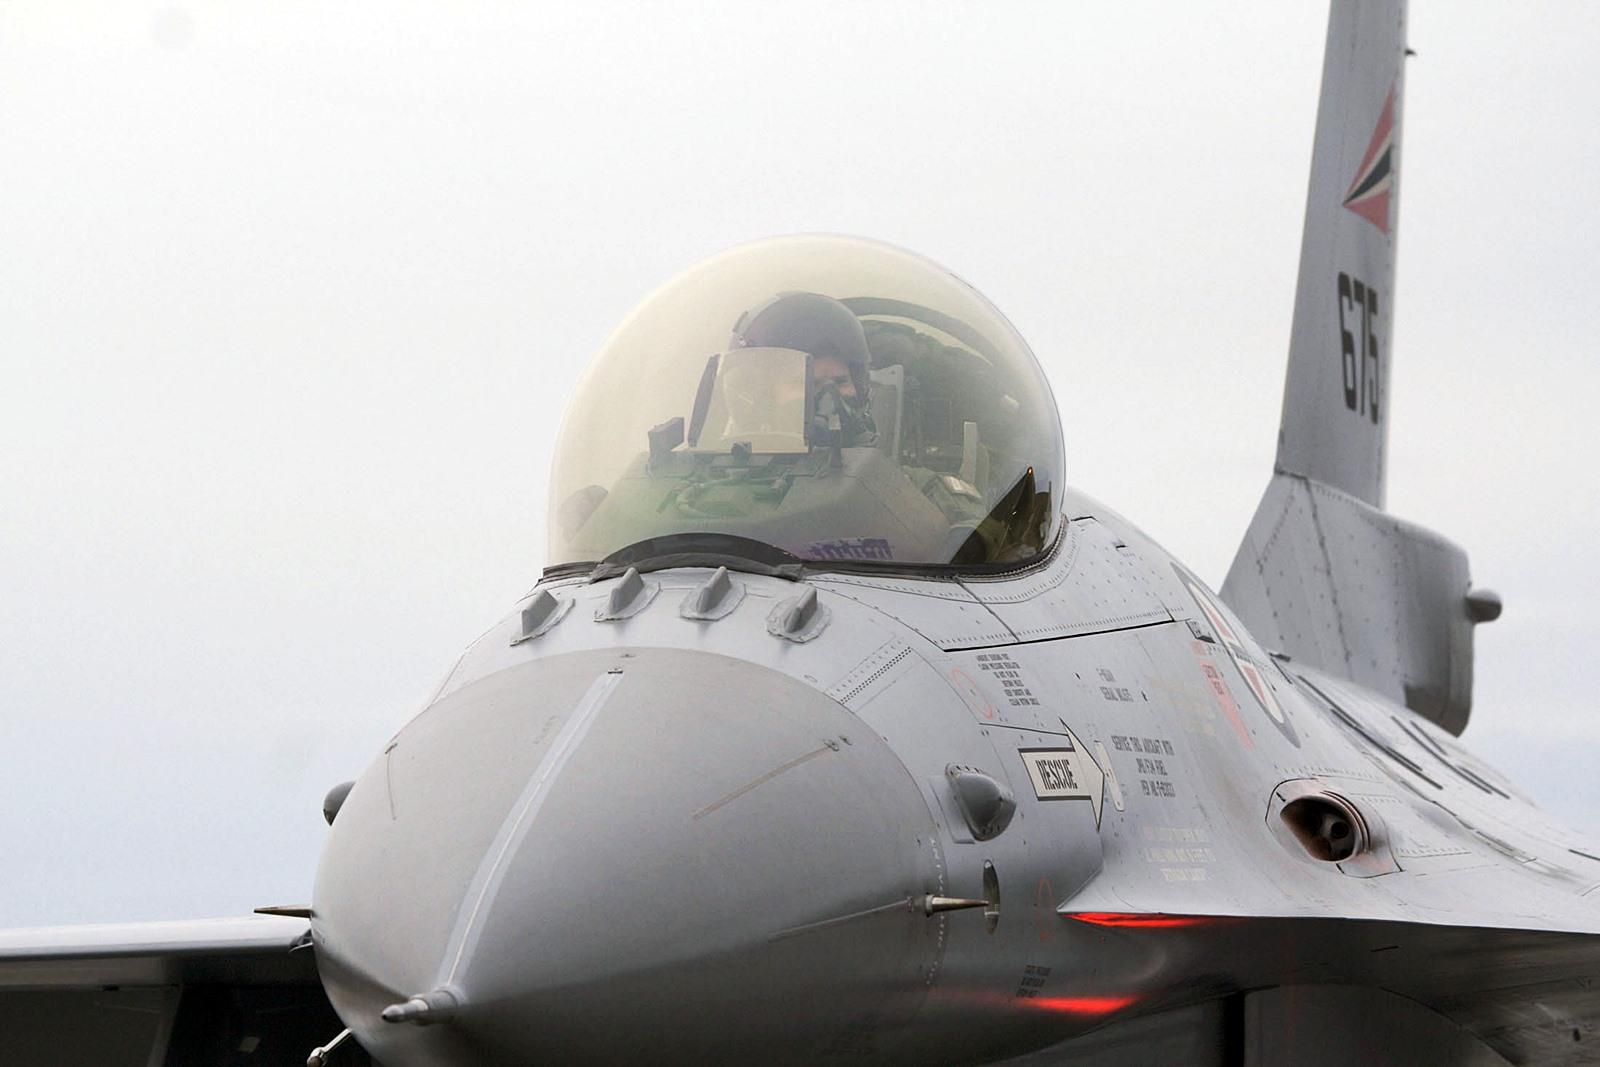 Iceland Air Meet 2014 수행하는 노르웨이공군 F-1..